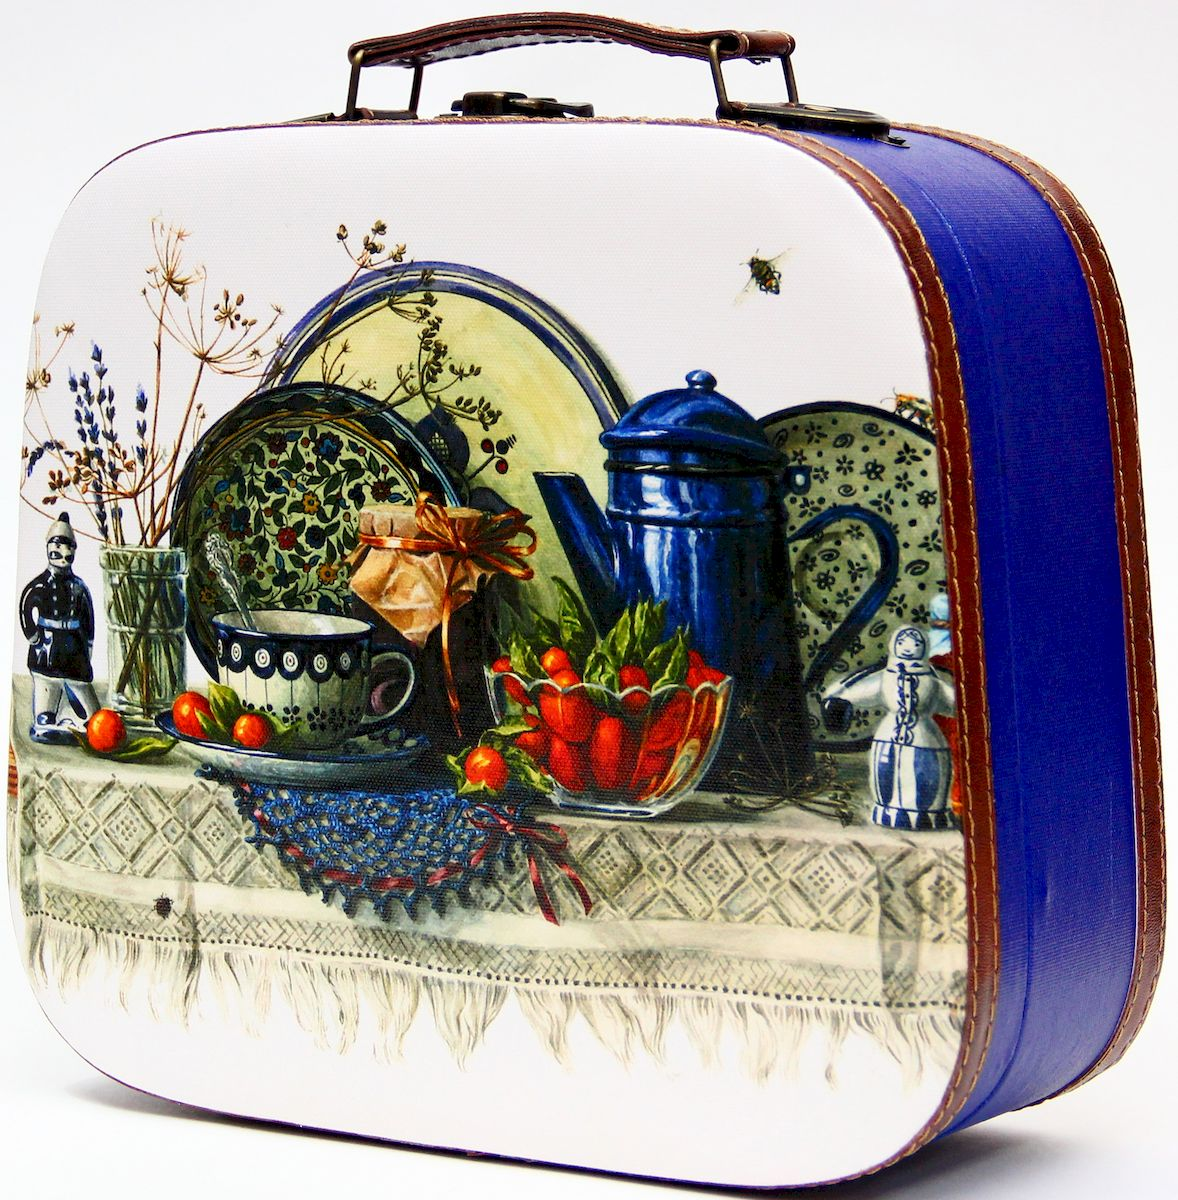 Шкатулка декоративная Magic Home Синий натюрморт, цвет: синий, 28,5 х 25 х 10,5 см шкатулки magic home шкатулка дождь в париже